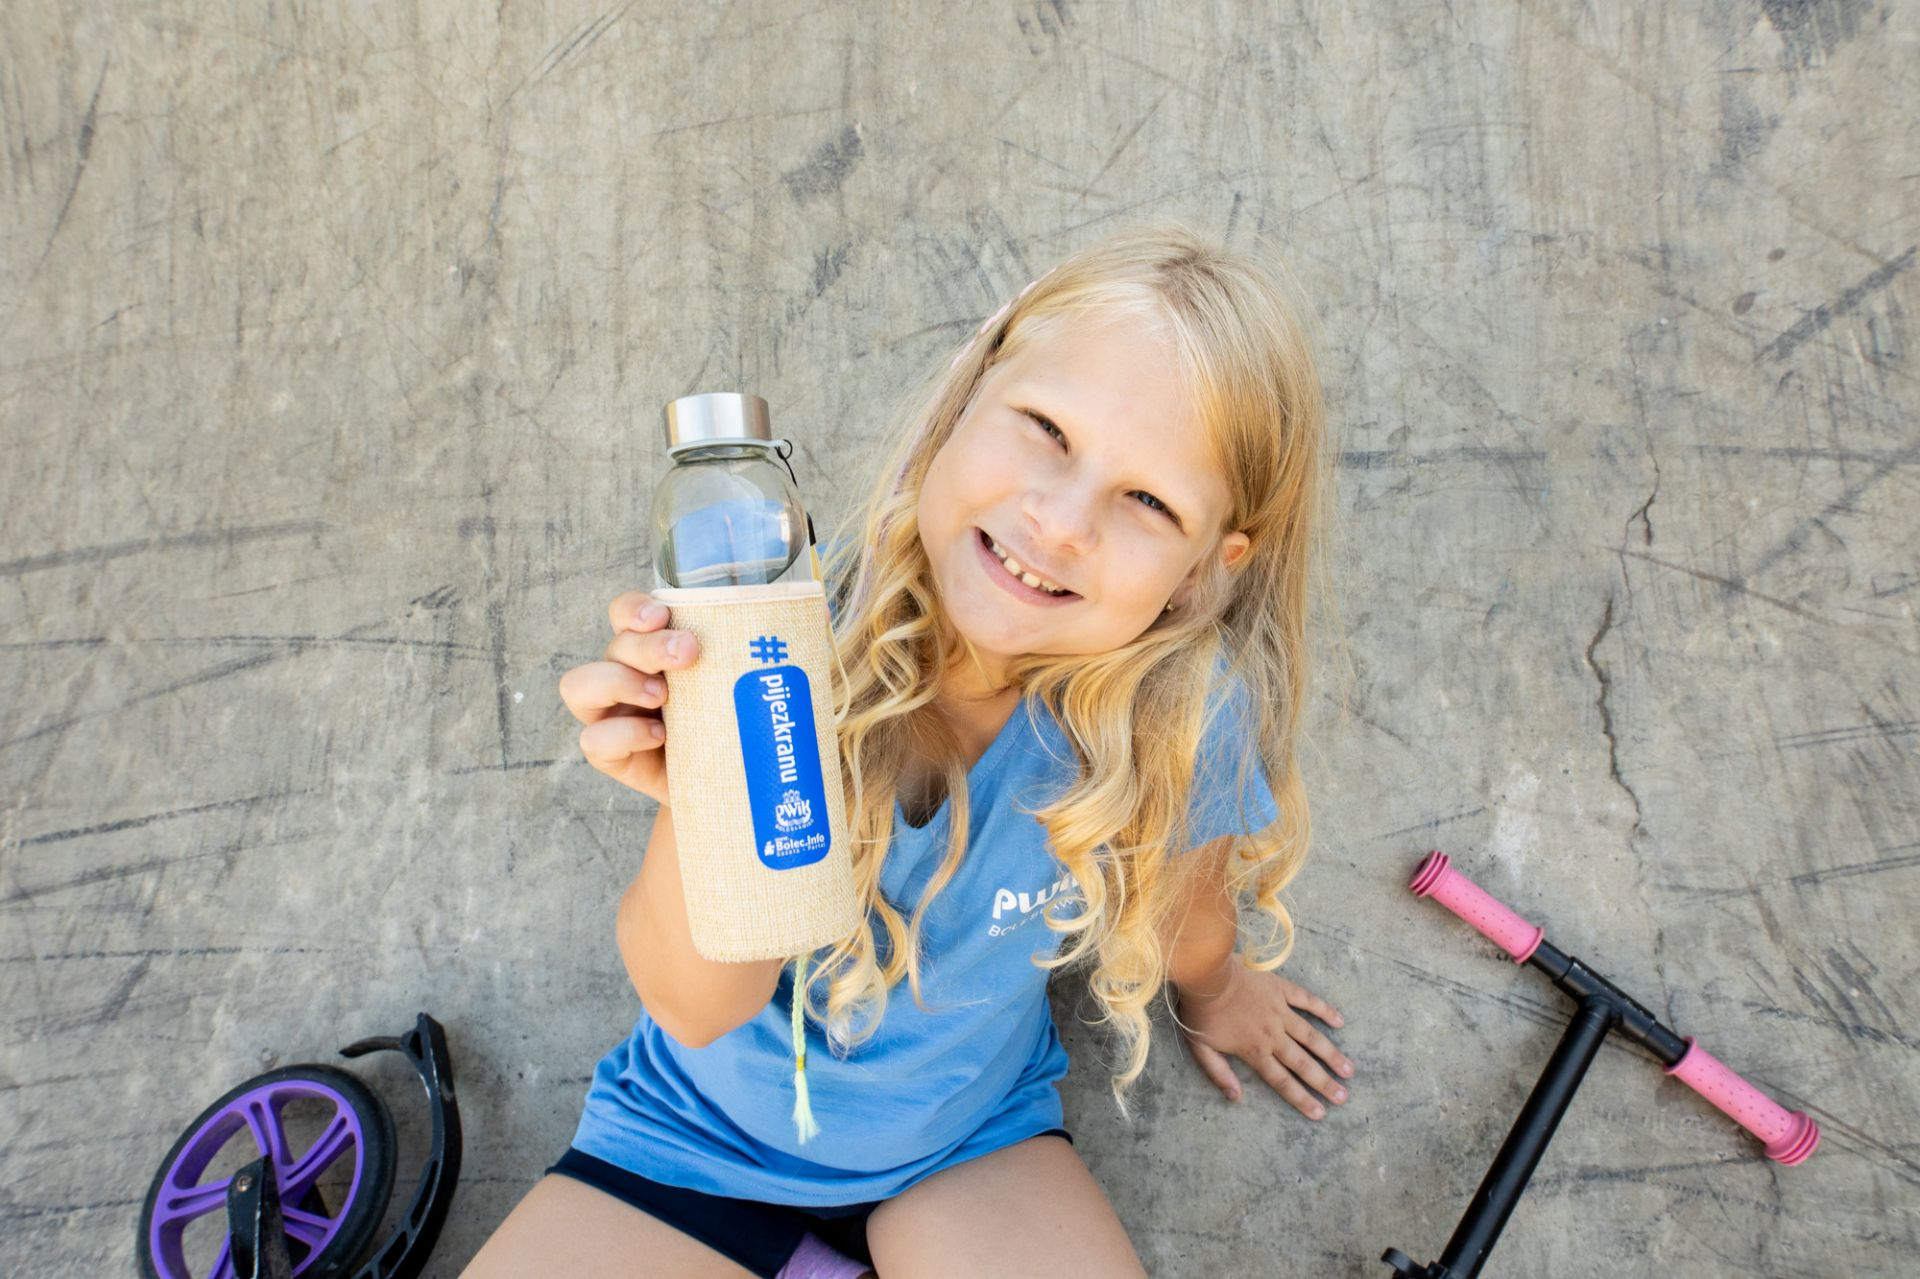 Chcesz taką butelkę? (fot.Bolec.Info)